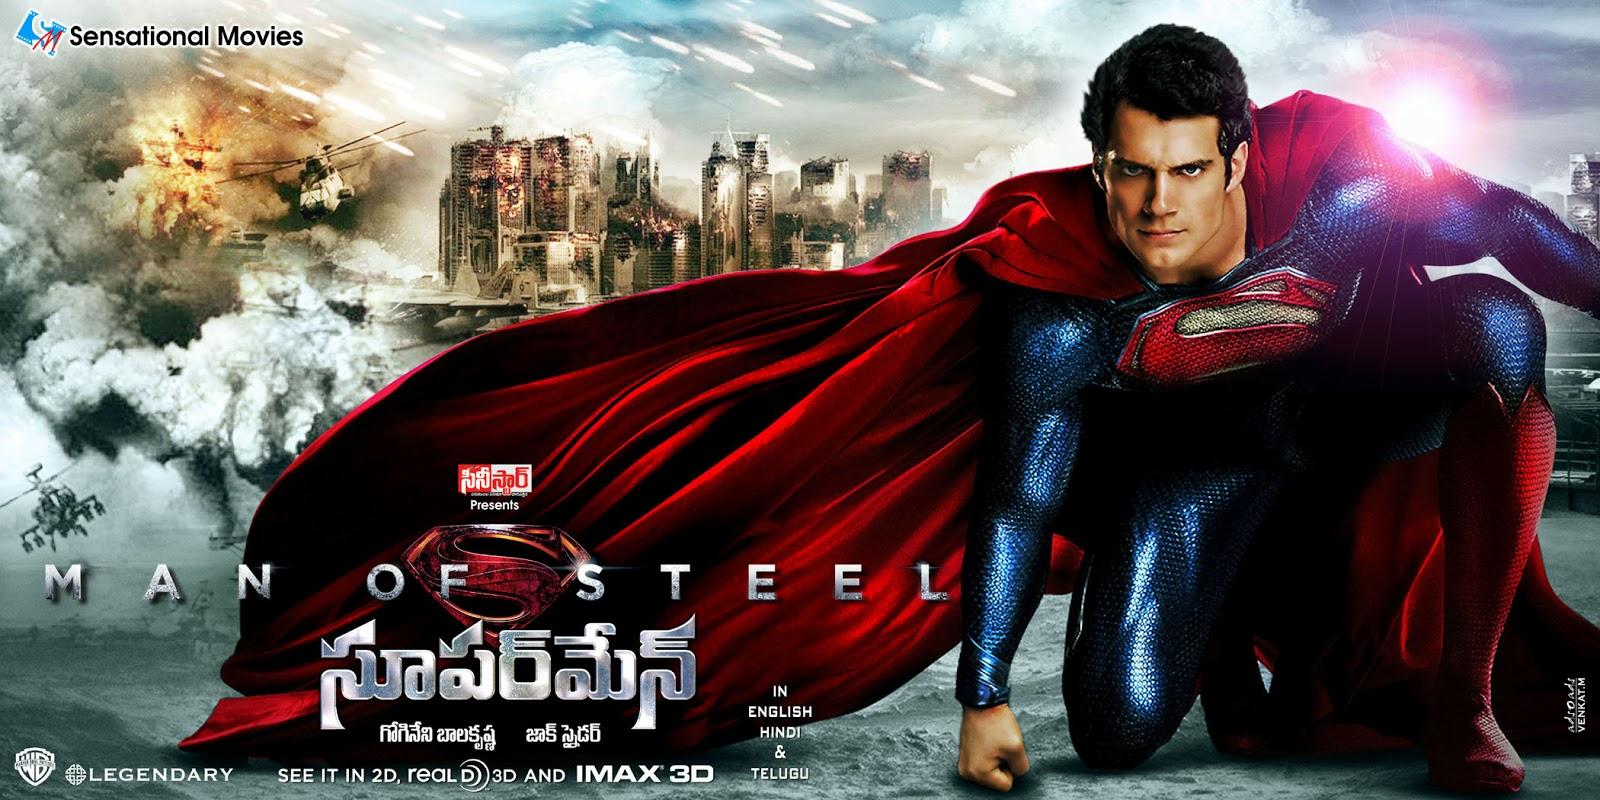 Man of Steel - Superman Wallpapers (Telugu) - TollyCinema365